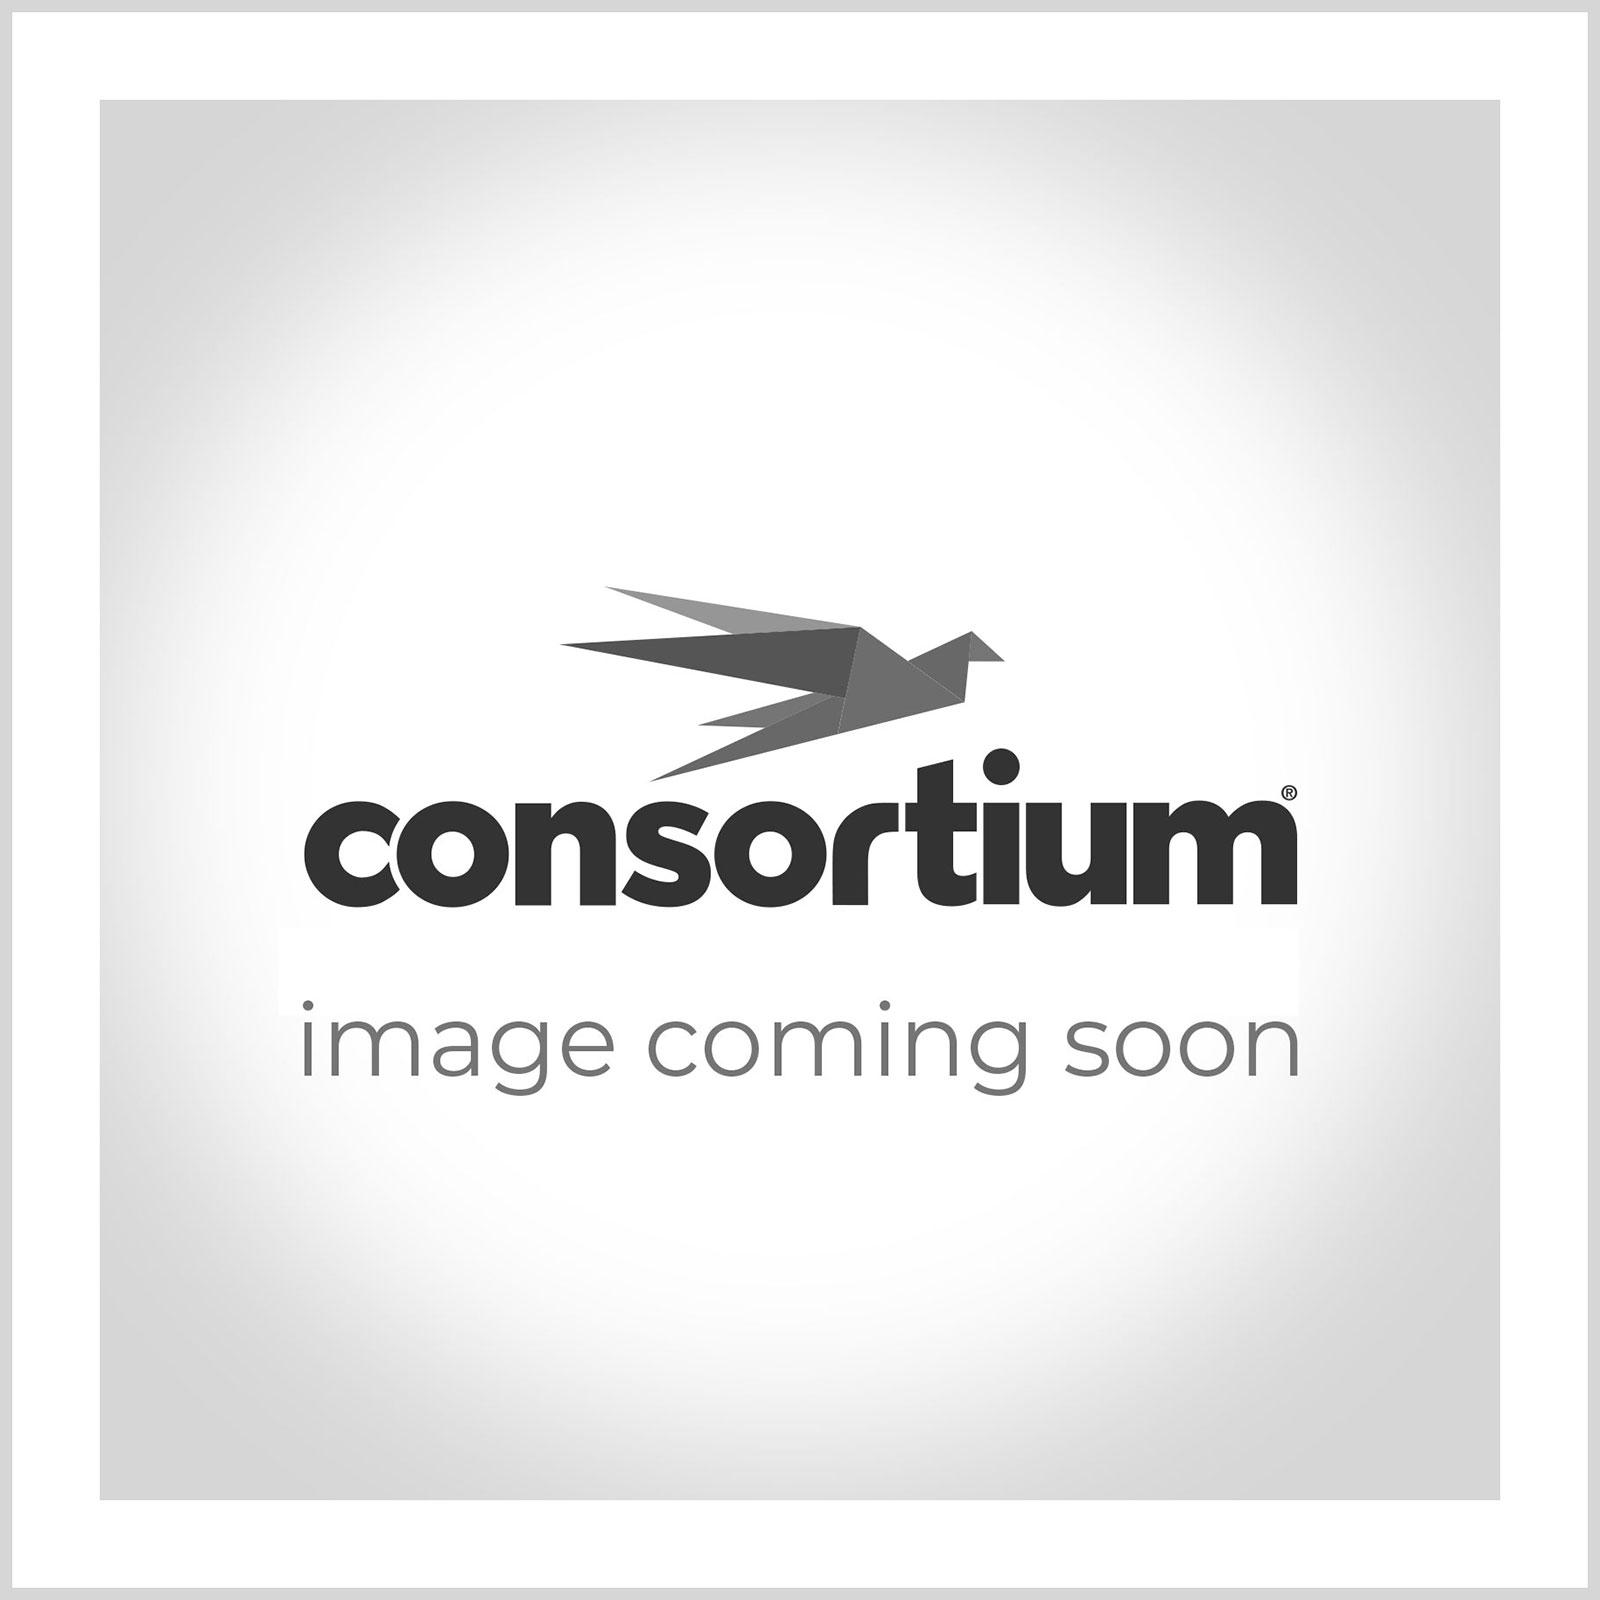 Carlton ISO 4.3 Midi Blade Badminton Racket